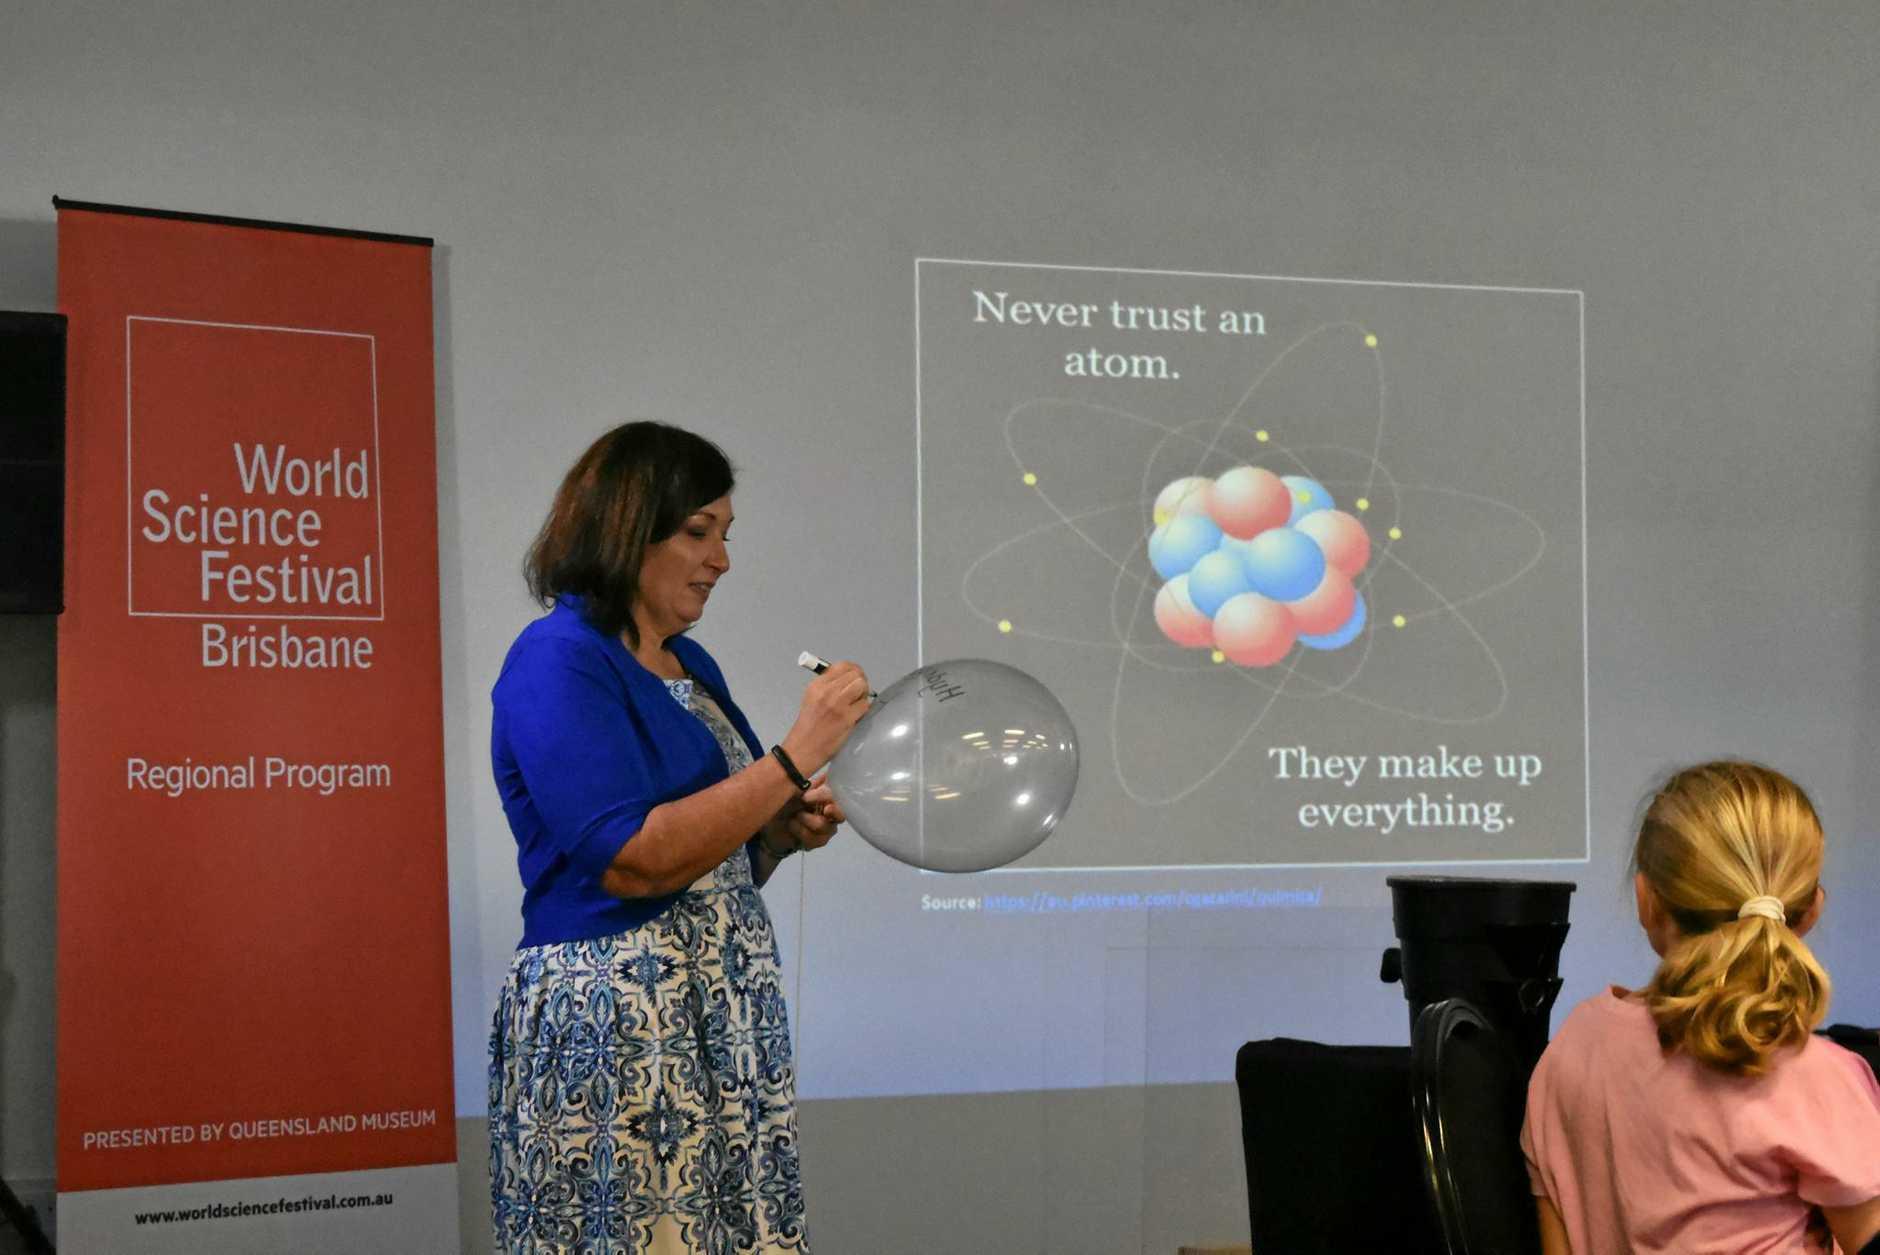 Science Minister Leeanne Enoch helps demonstrate how a Hydrogen atom works.